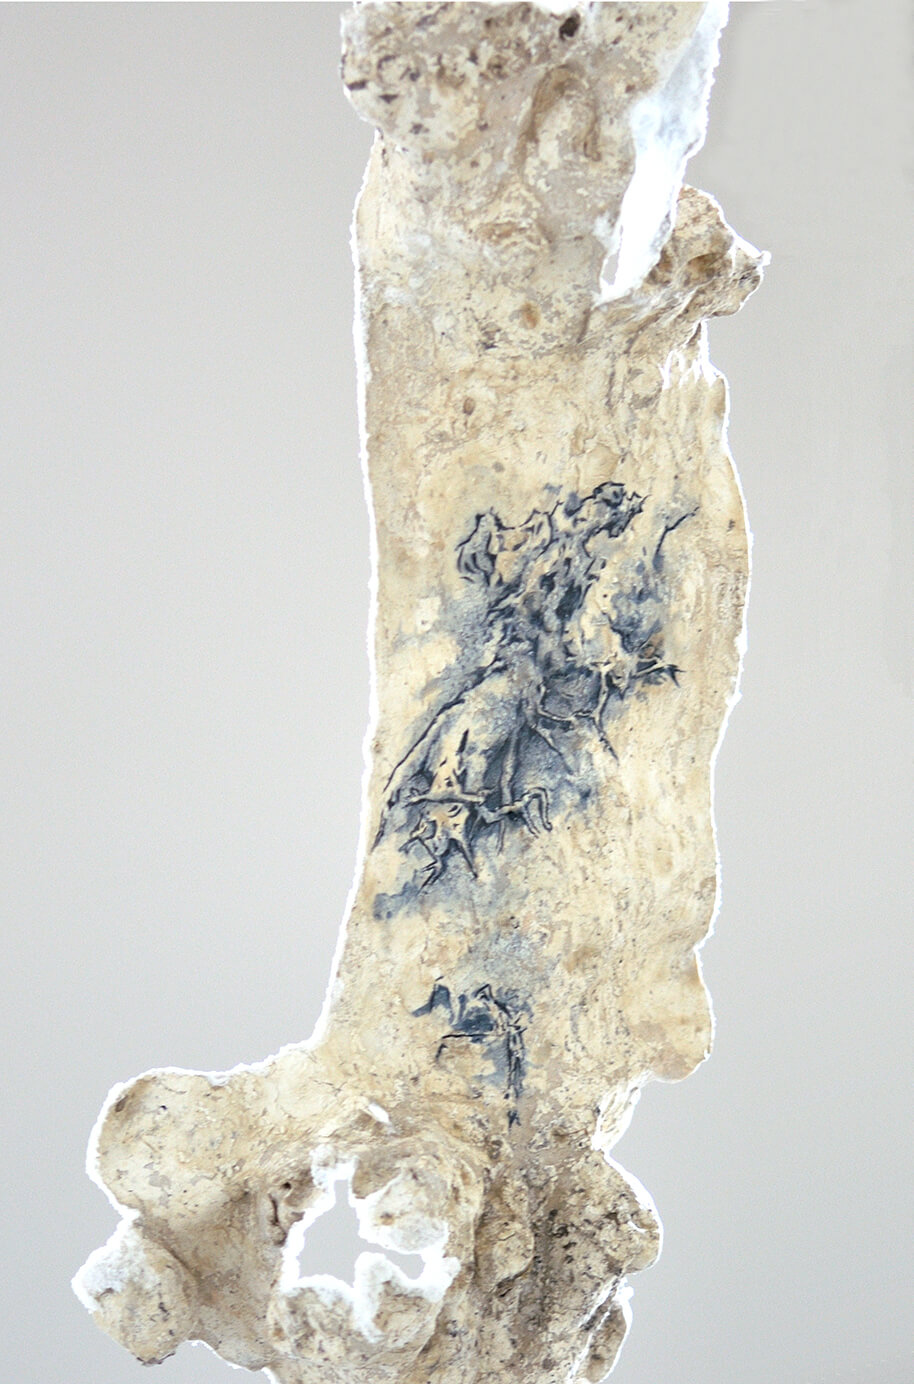 June Papineau, Goyesca No. 5, 2017